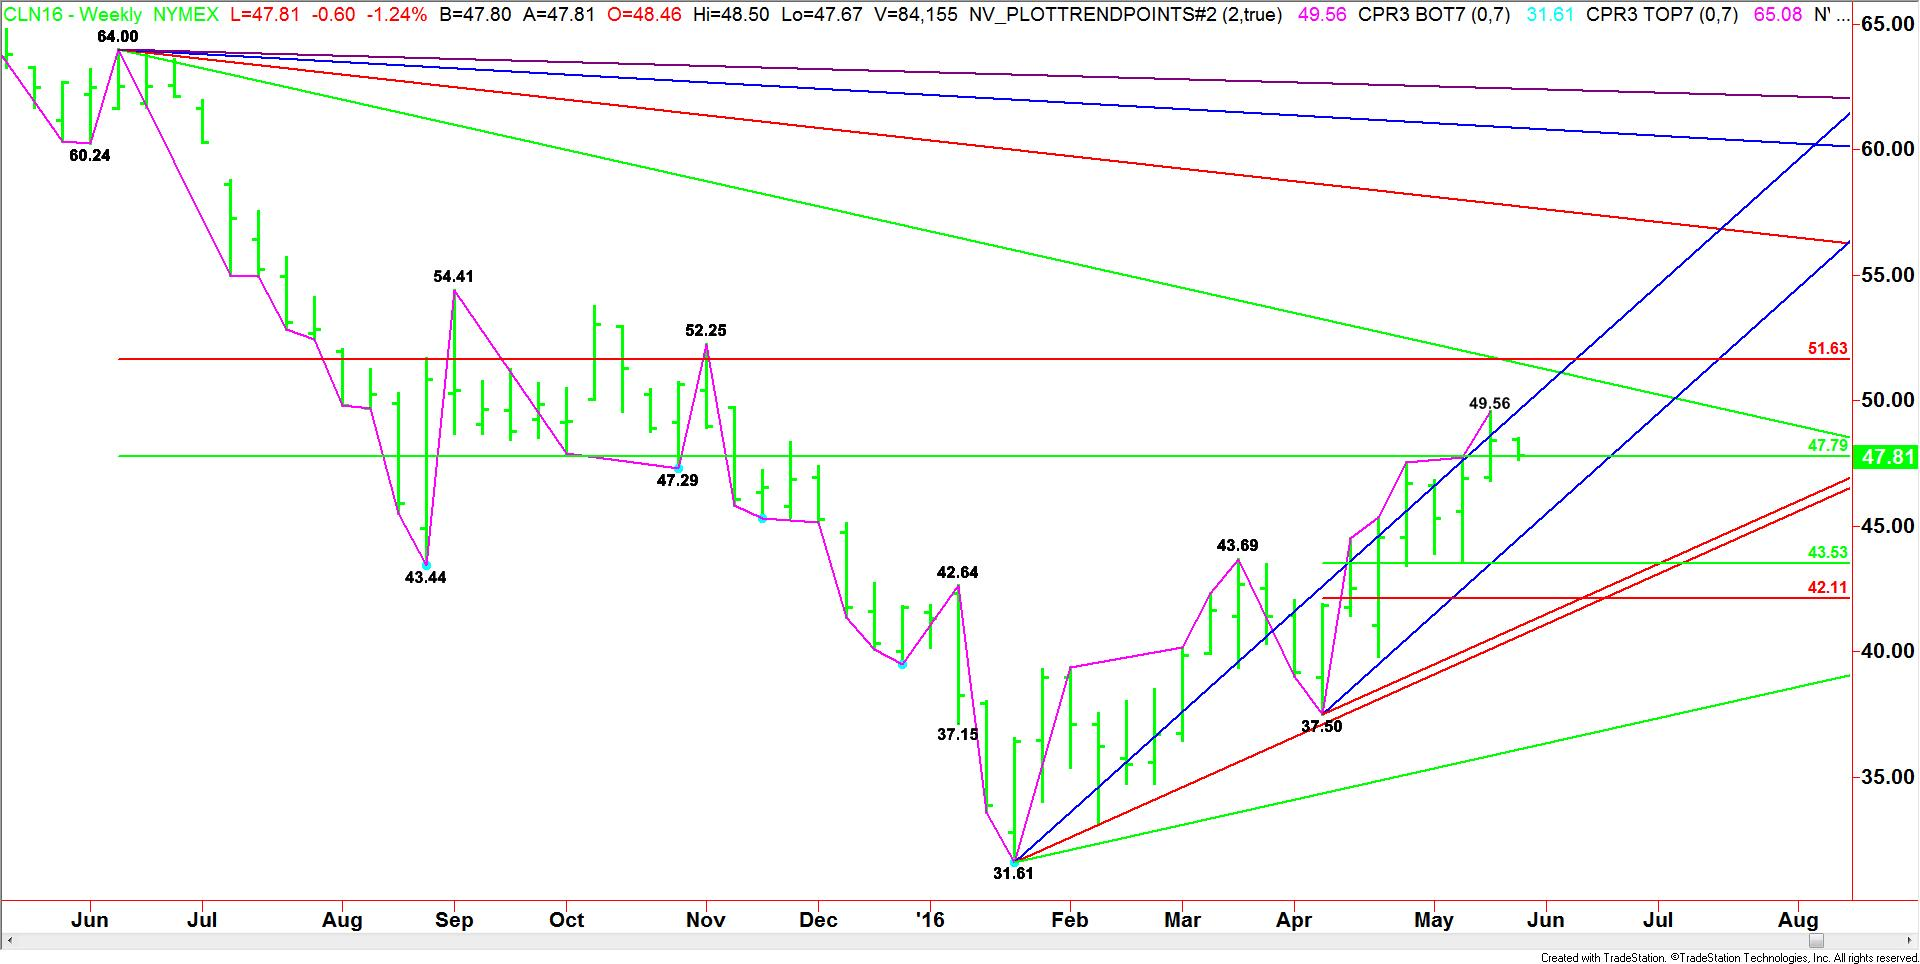 Weekly July Crude Oil